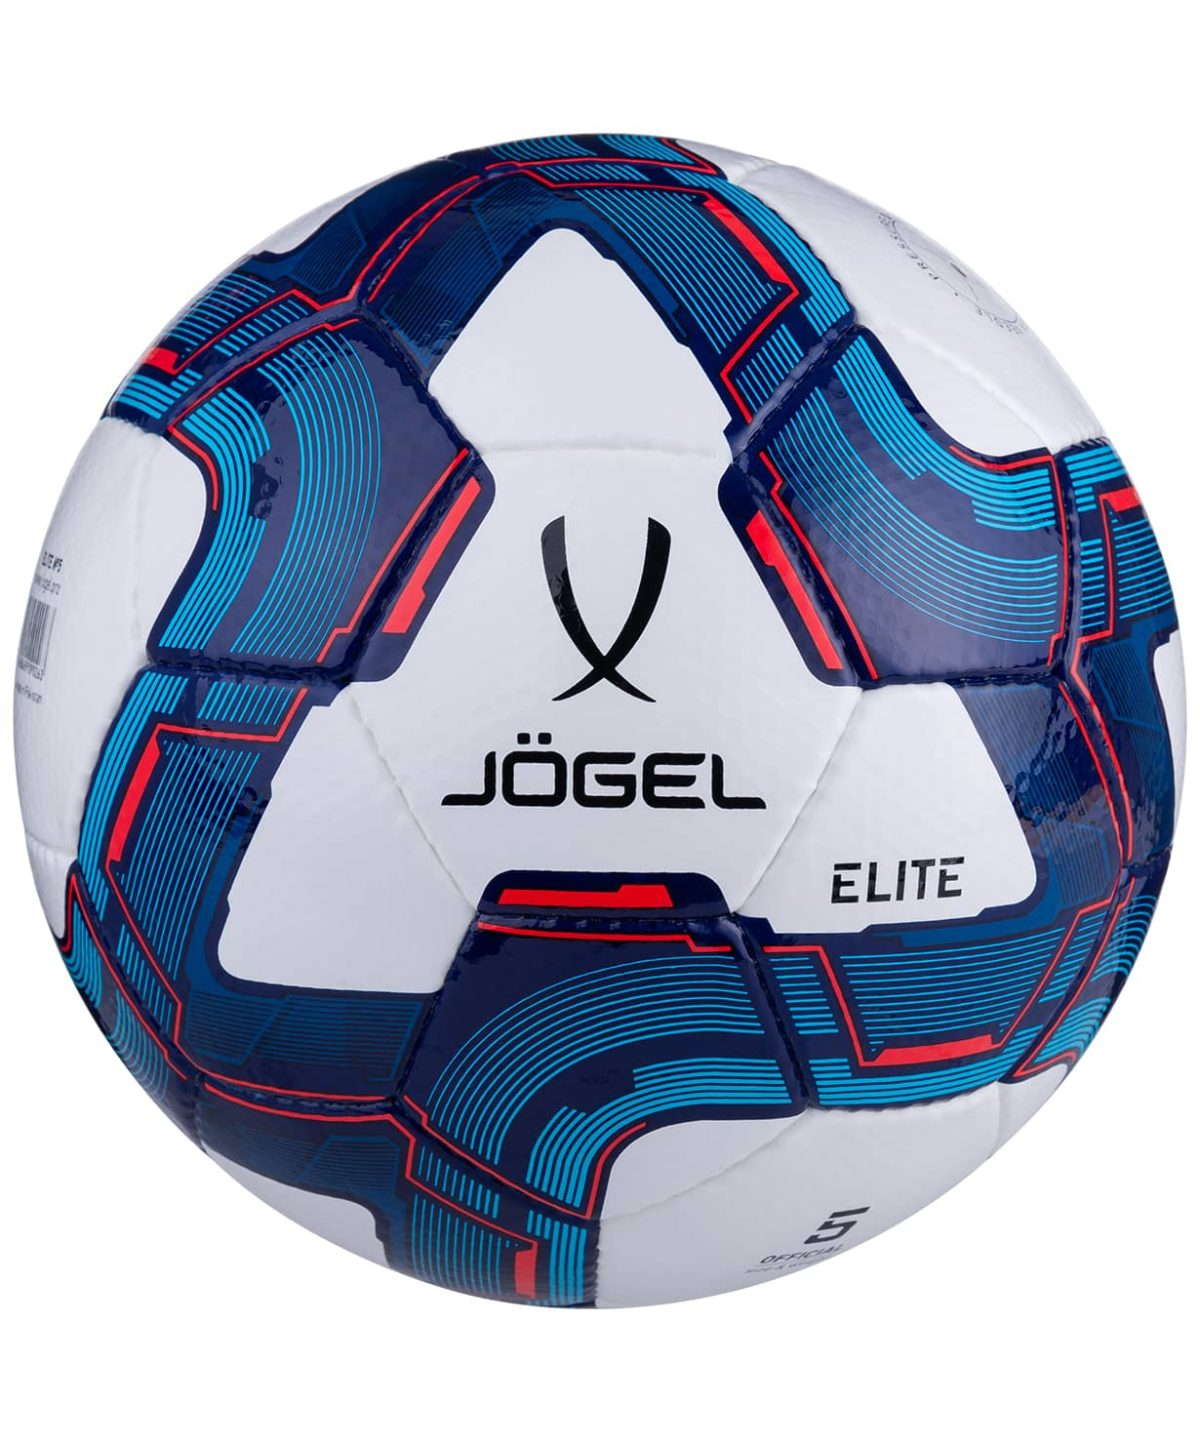 JOGEL Elite  Мяч футбольный  Elite №5 (BC20) - 1